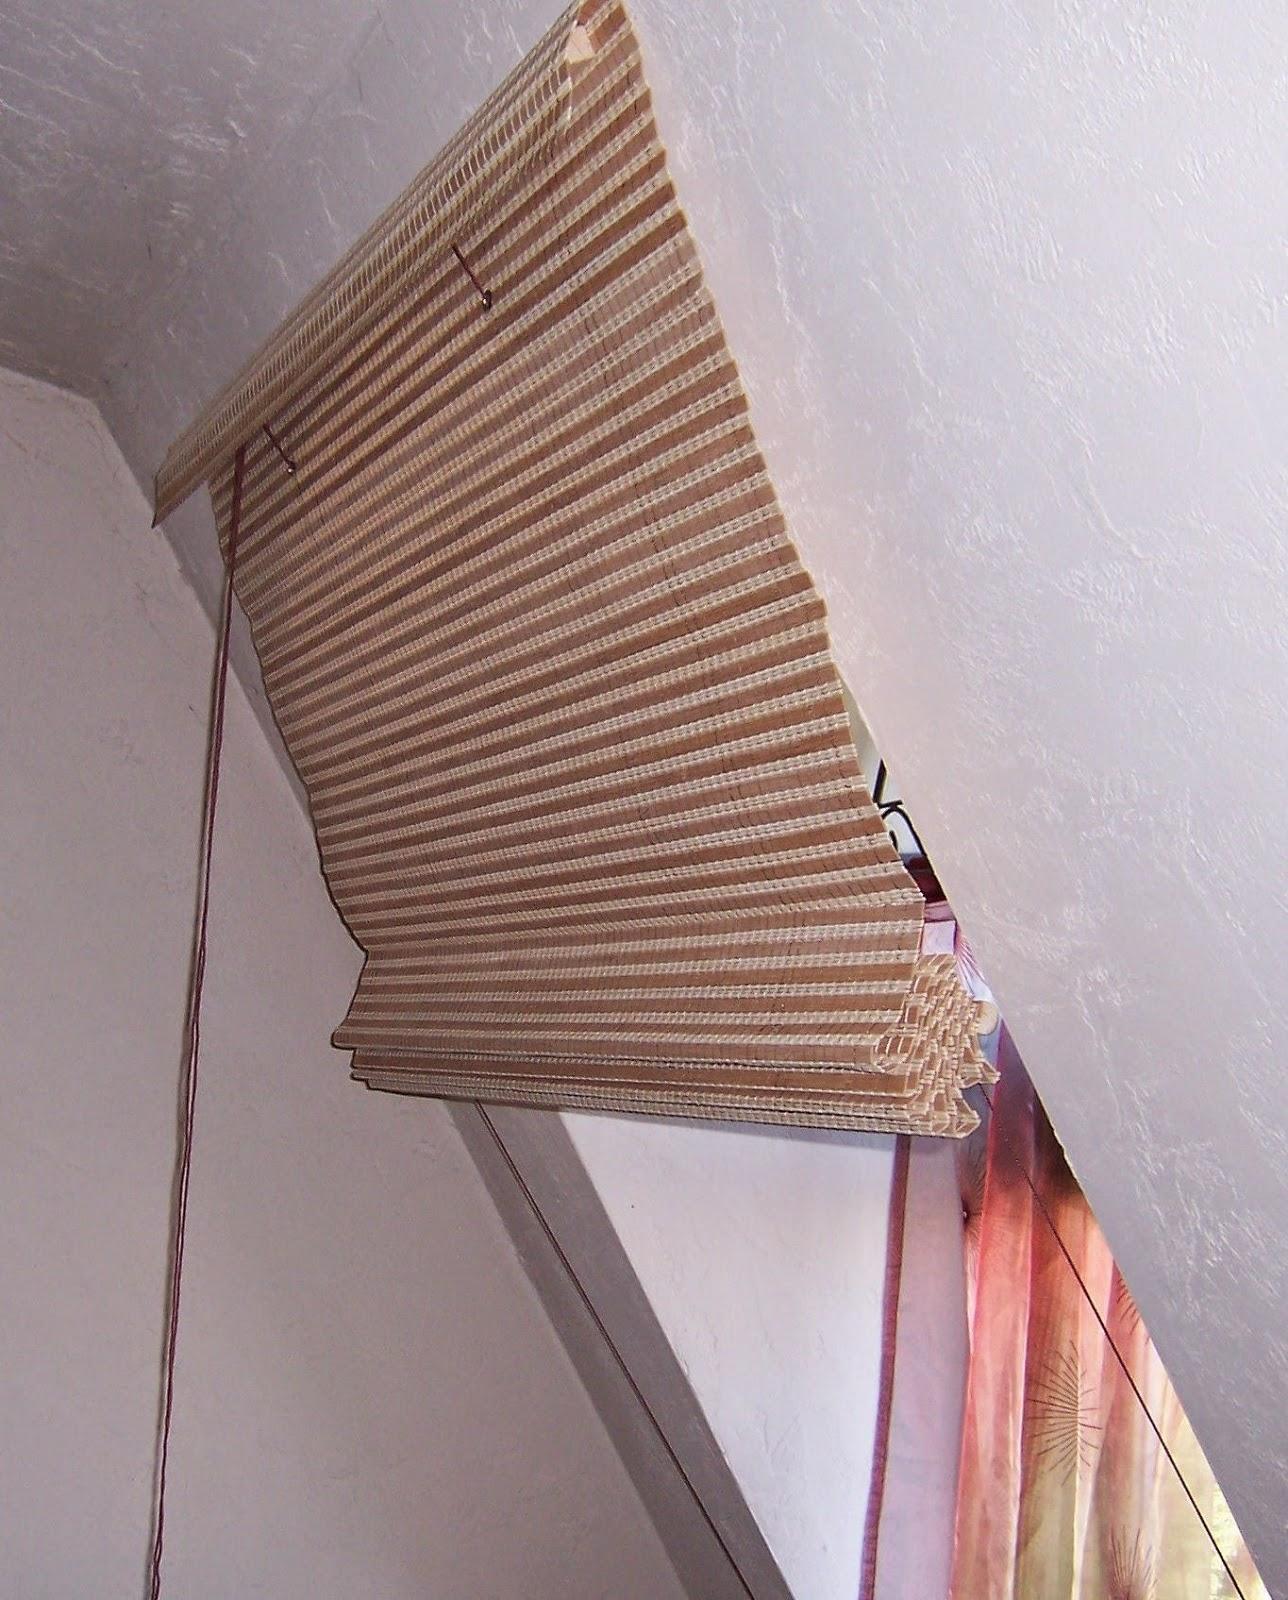 bambusrollo nach ma jalousie nach ma k nnen auch. Black Bedroom Furniture Sets. Home Design Ideas